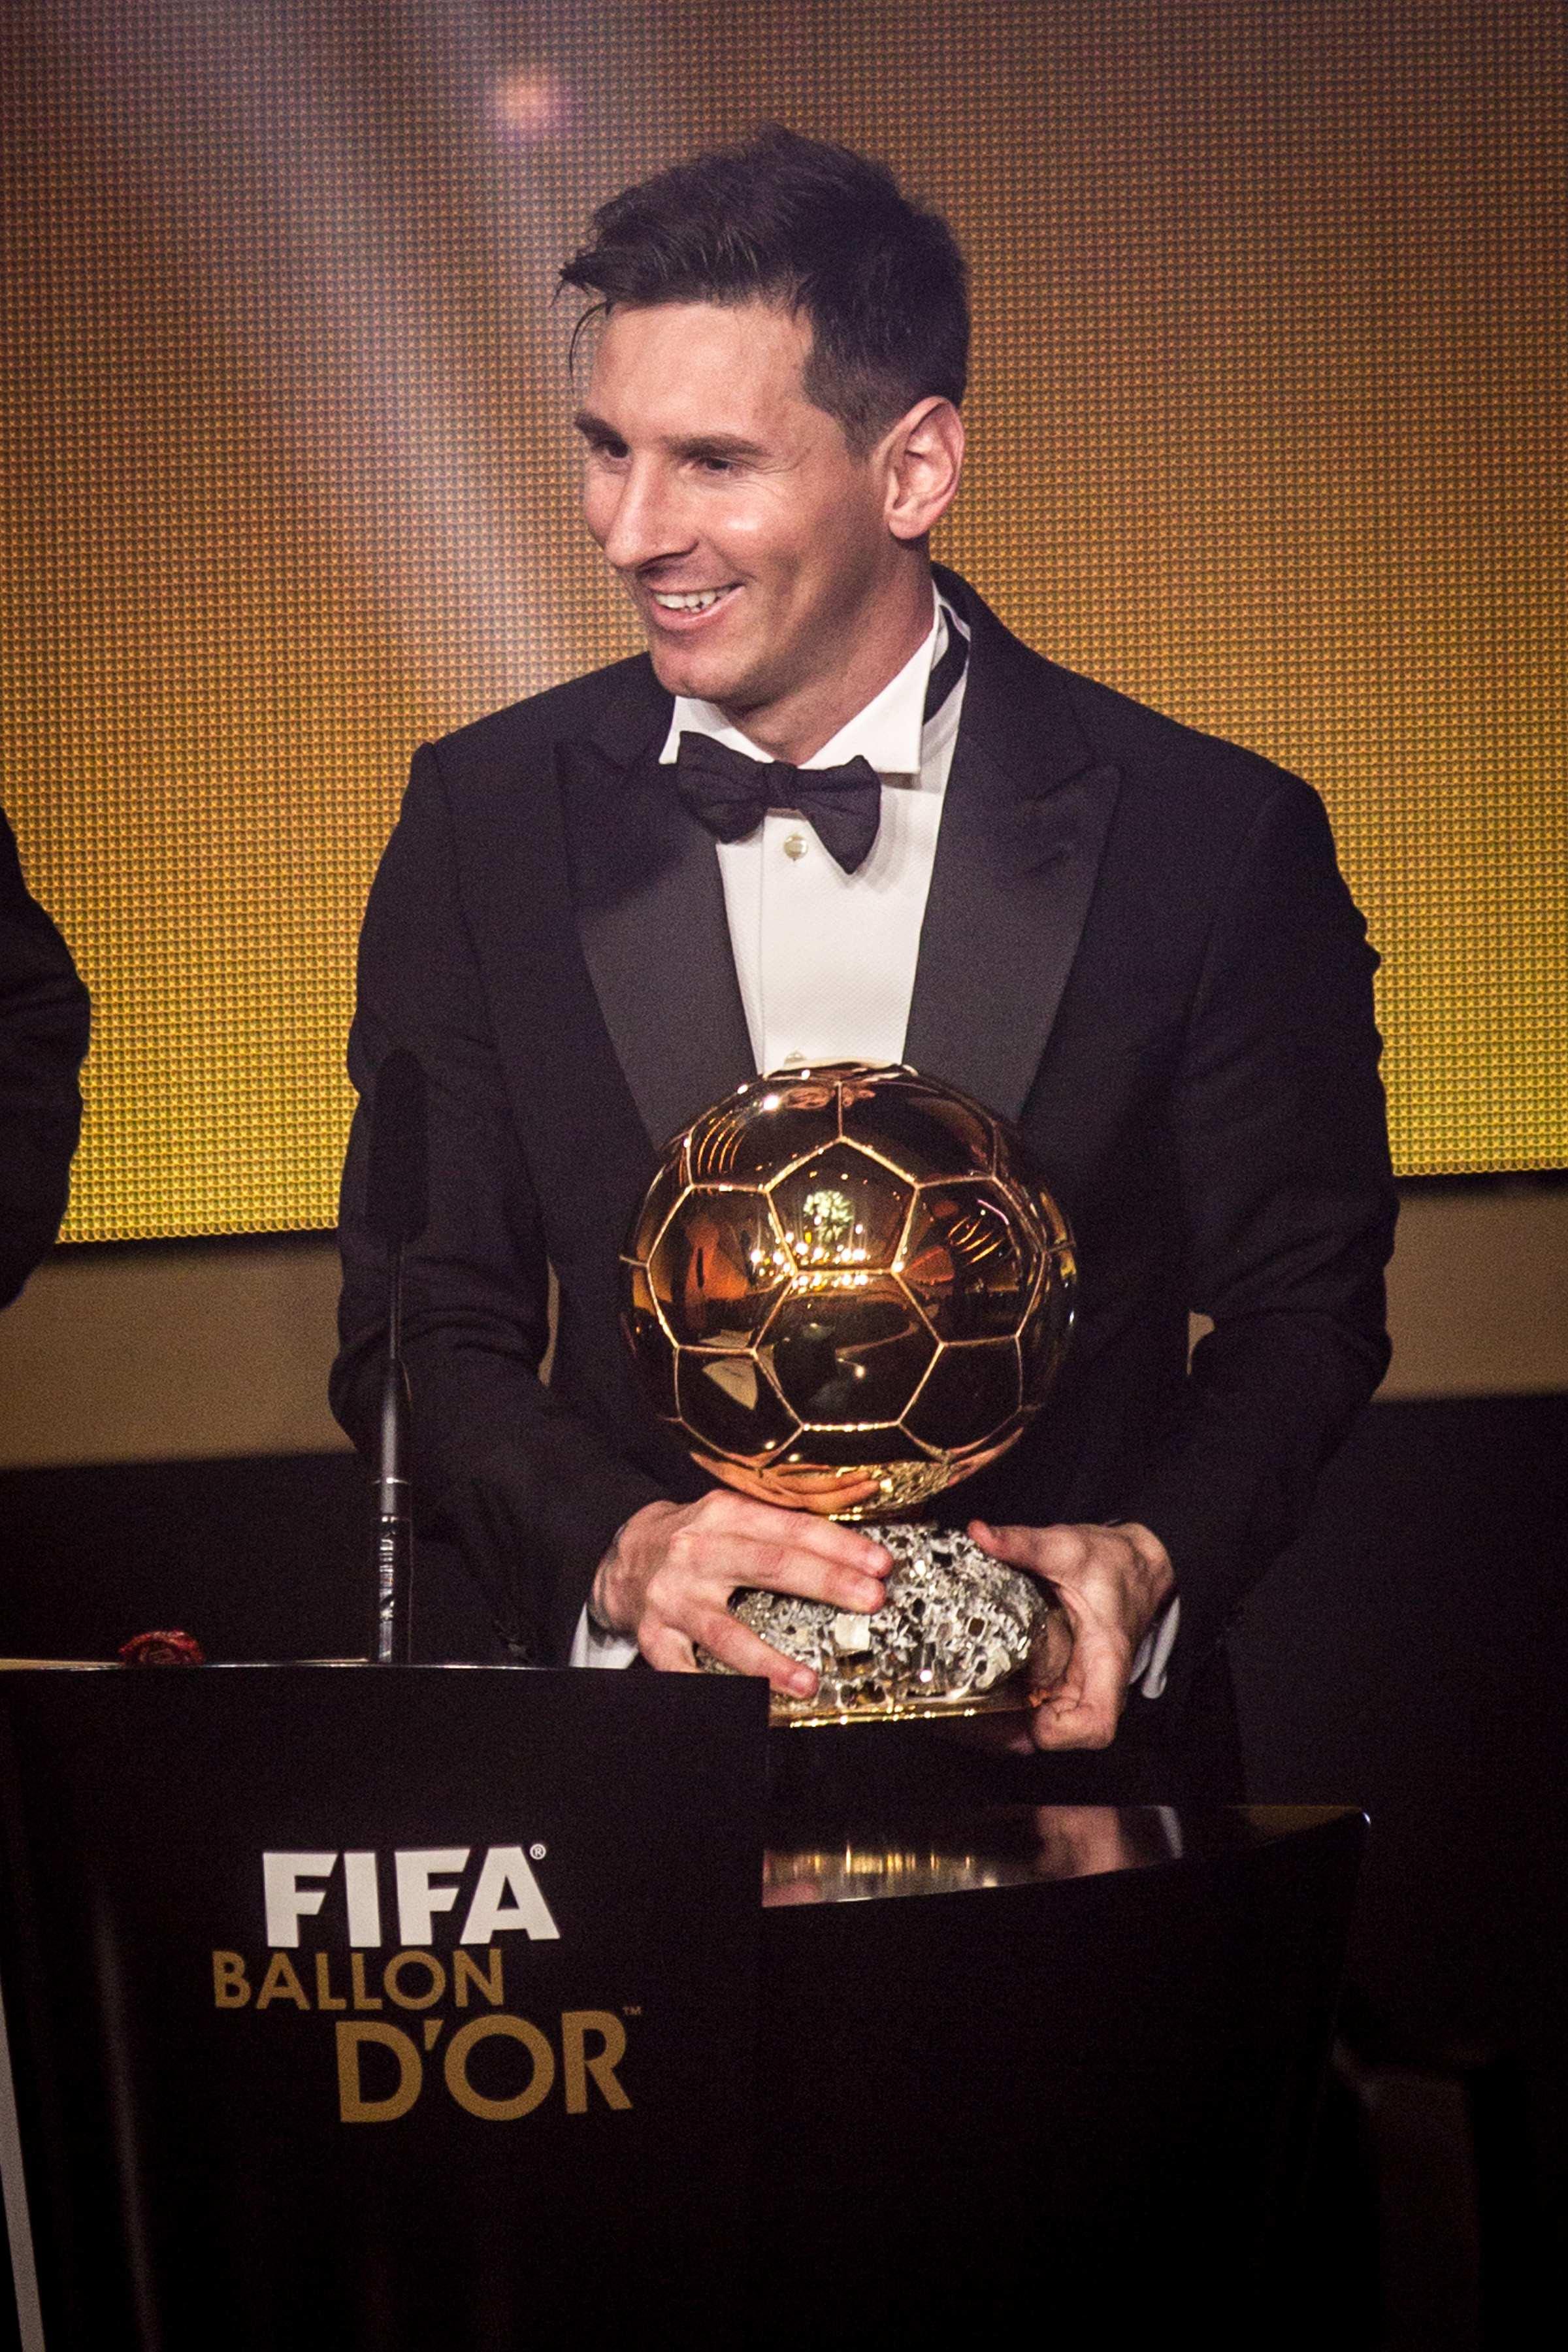 La Pulga De Las Vegas >> Messi gana su quinto Balón de Oro   ElMundo.net